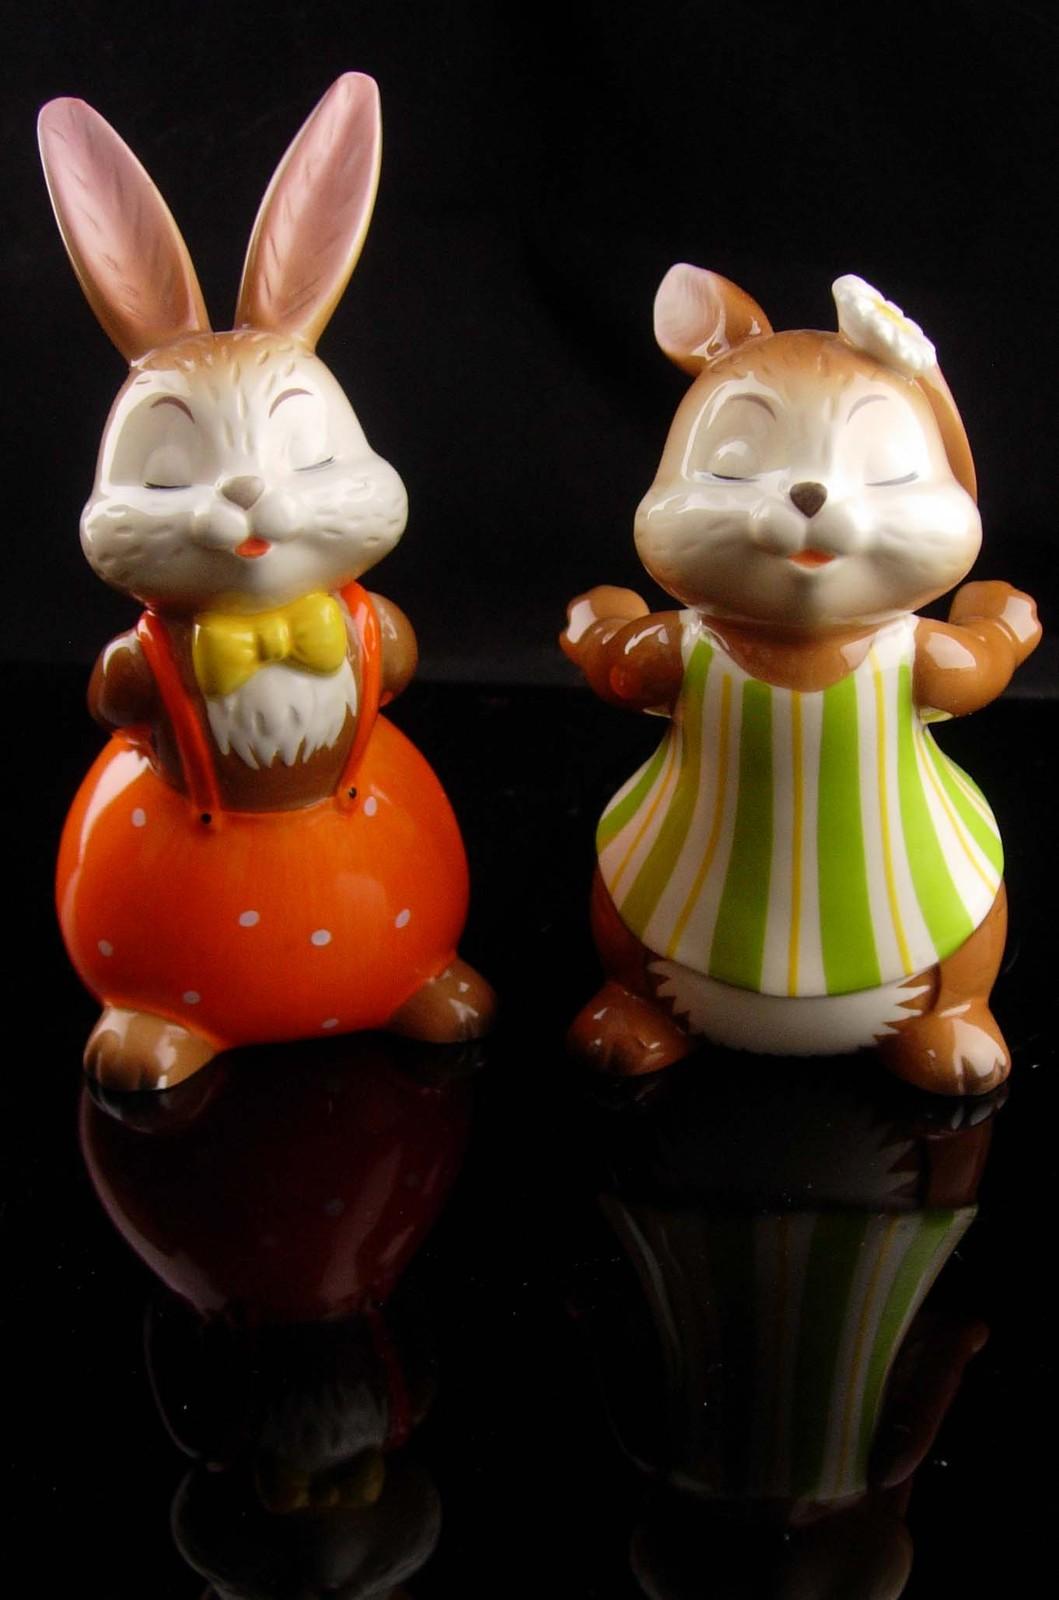 Vintage kissing bunny goebel - new mom gift - mothers day gift - german figurine image 5